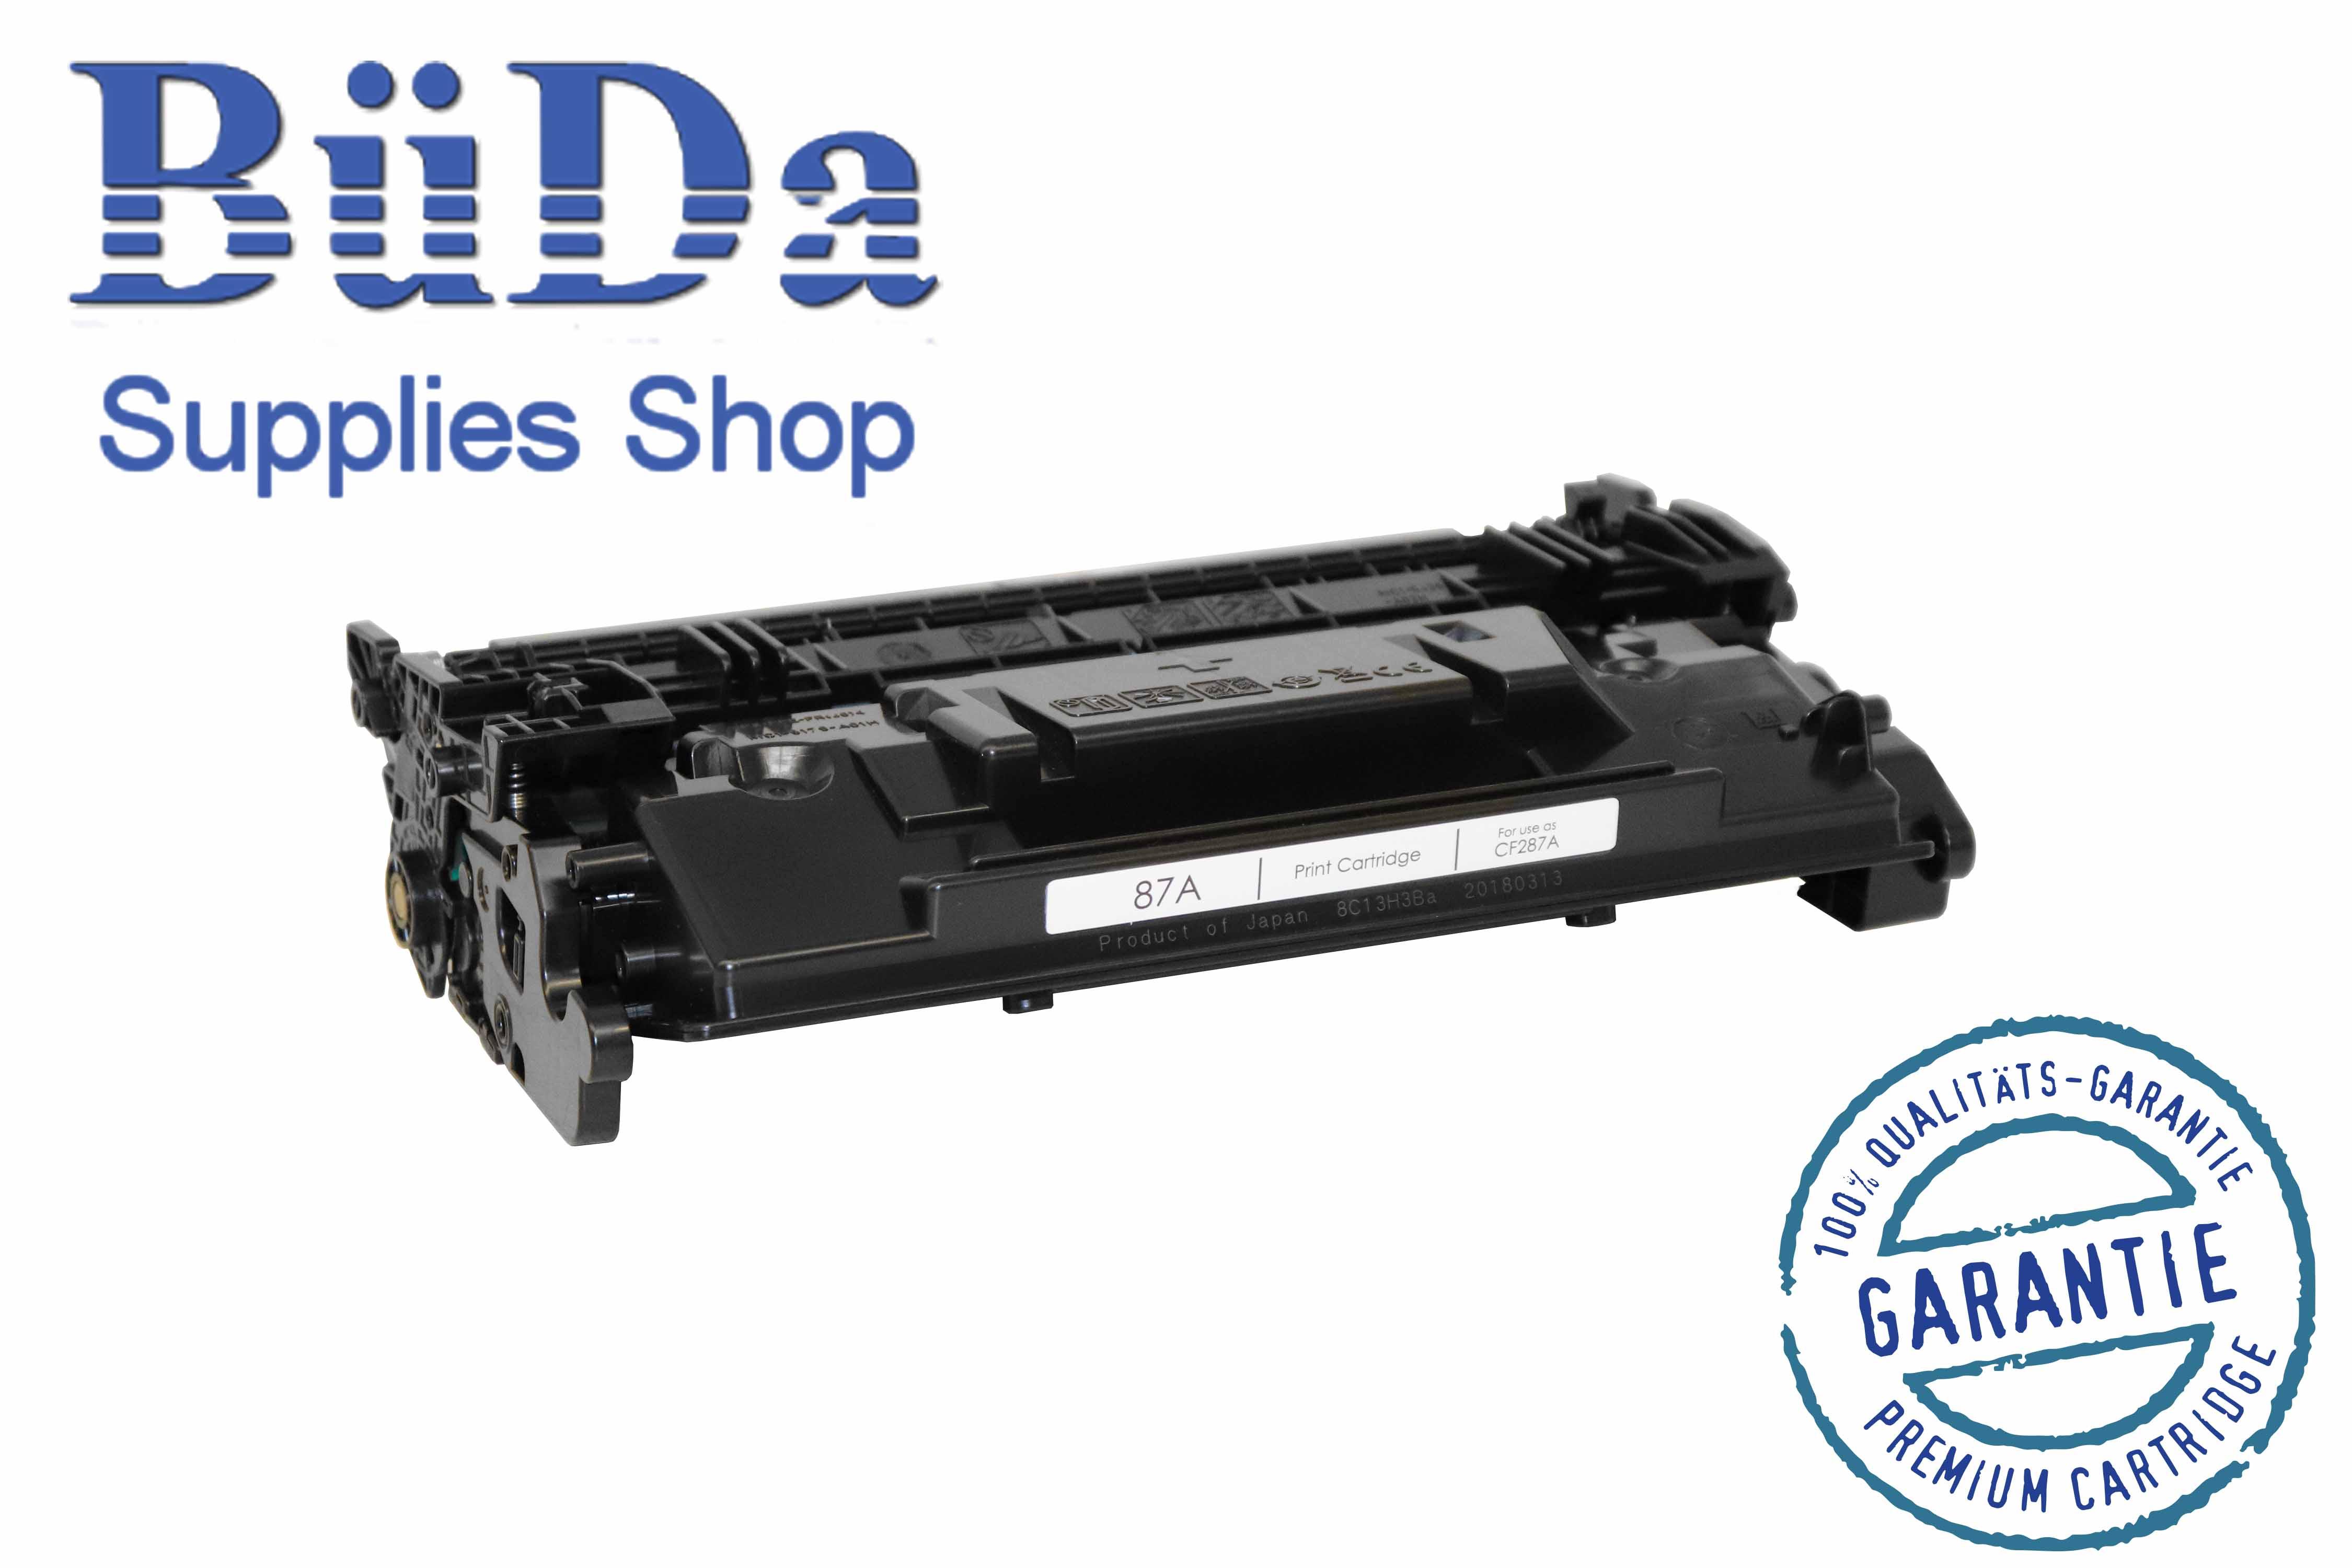 Toner-Modul komp. zu CF287A / CRG 041 black 9000 Seiten